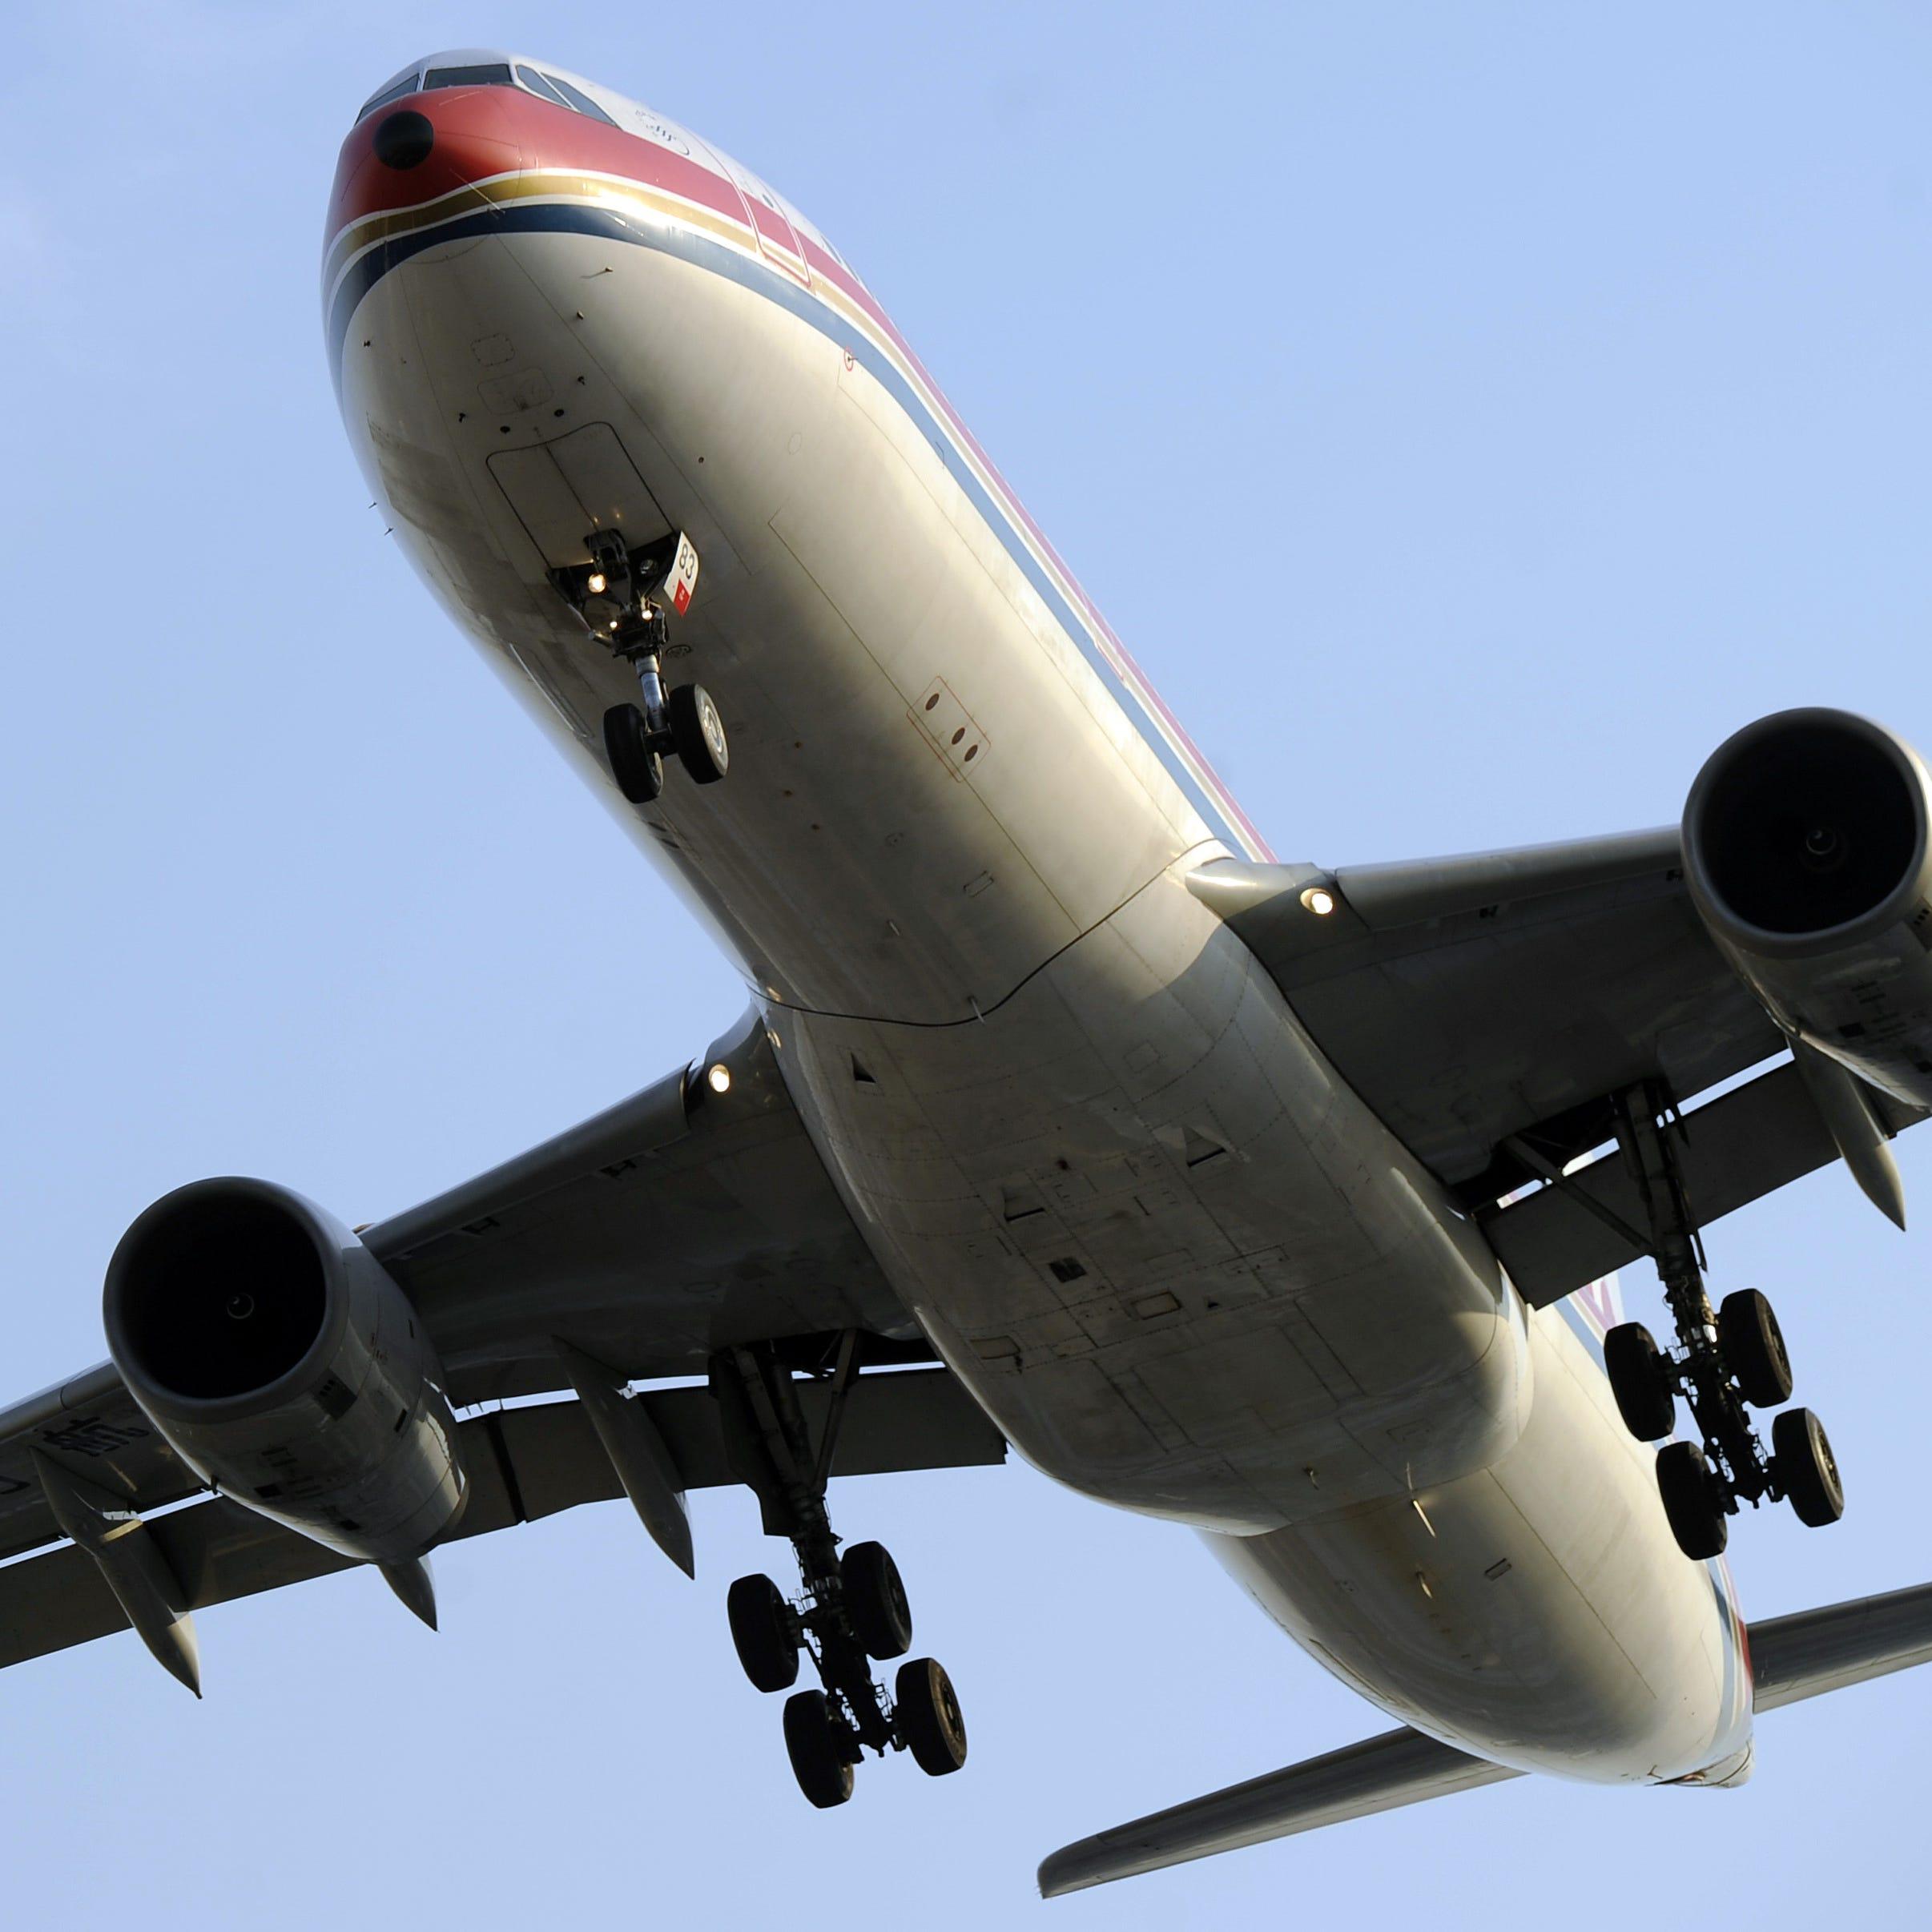 An airliner flies into Hongqiao International airport in Shanghai on Jan. 5, 2012.